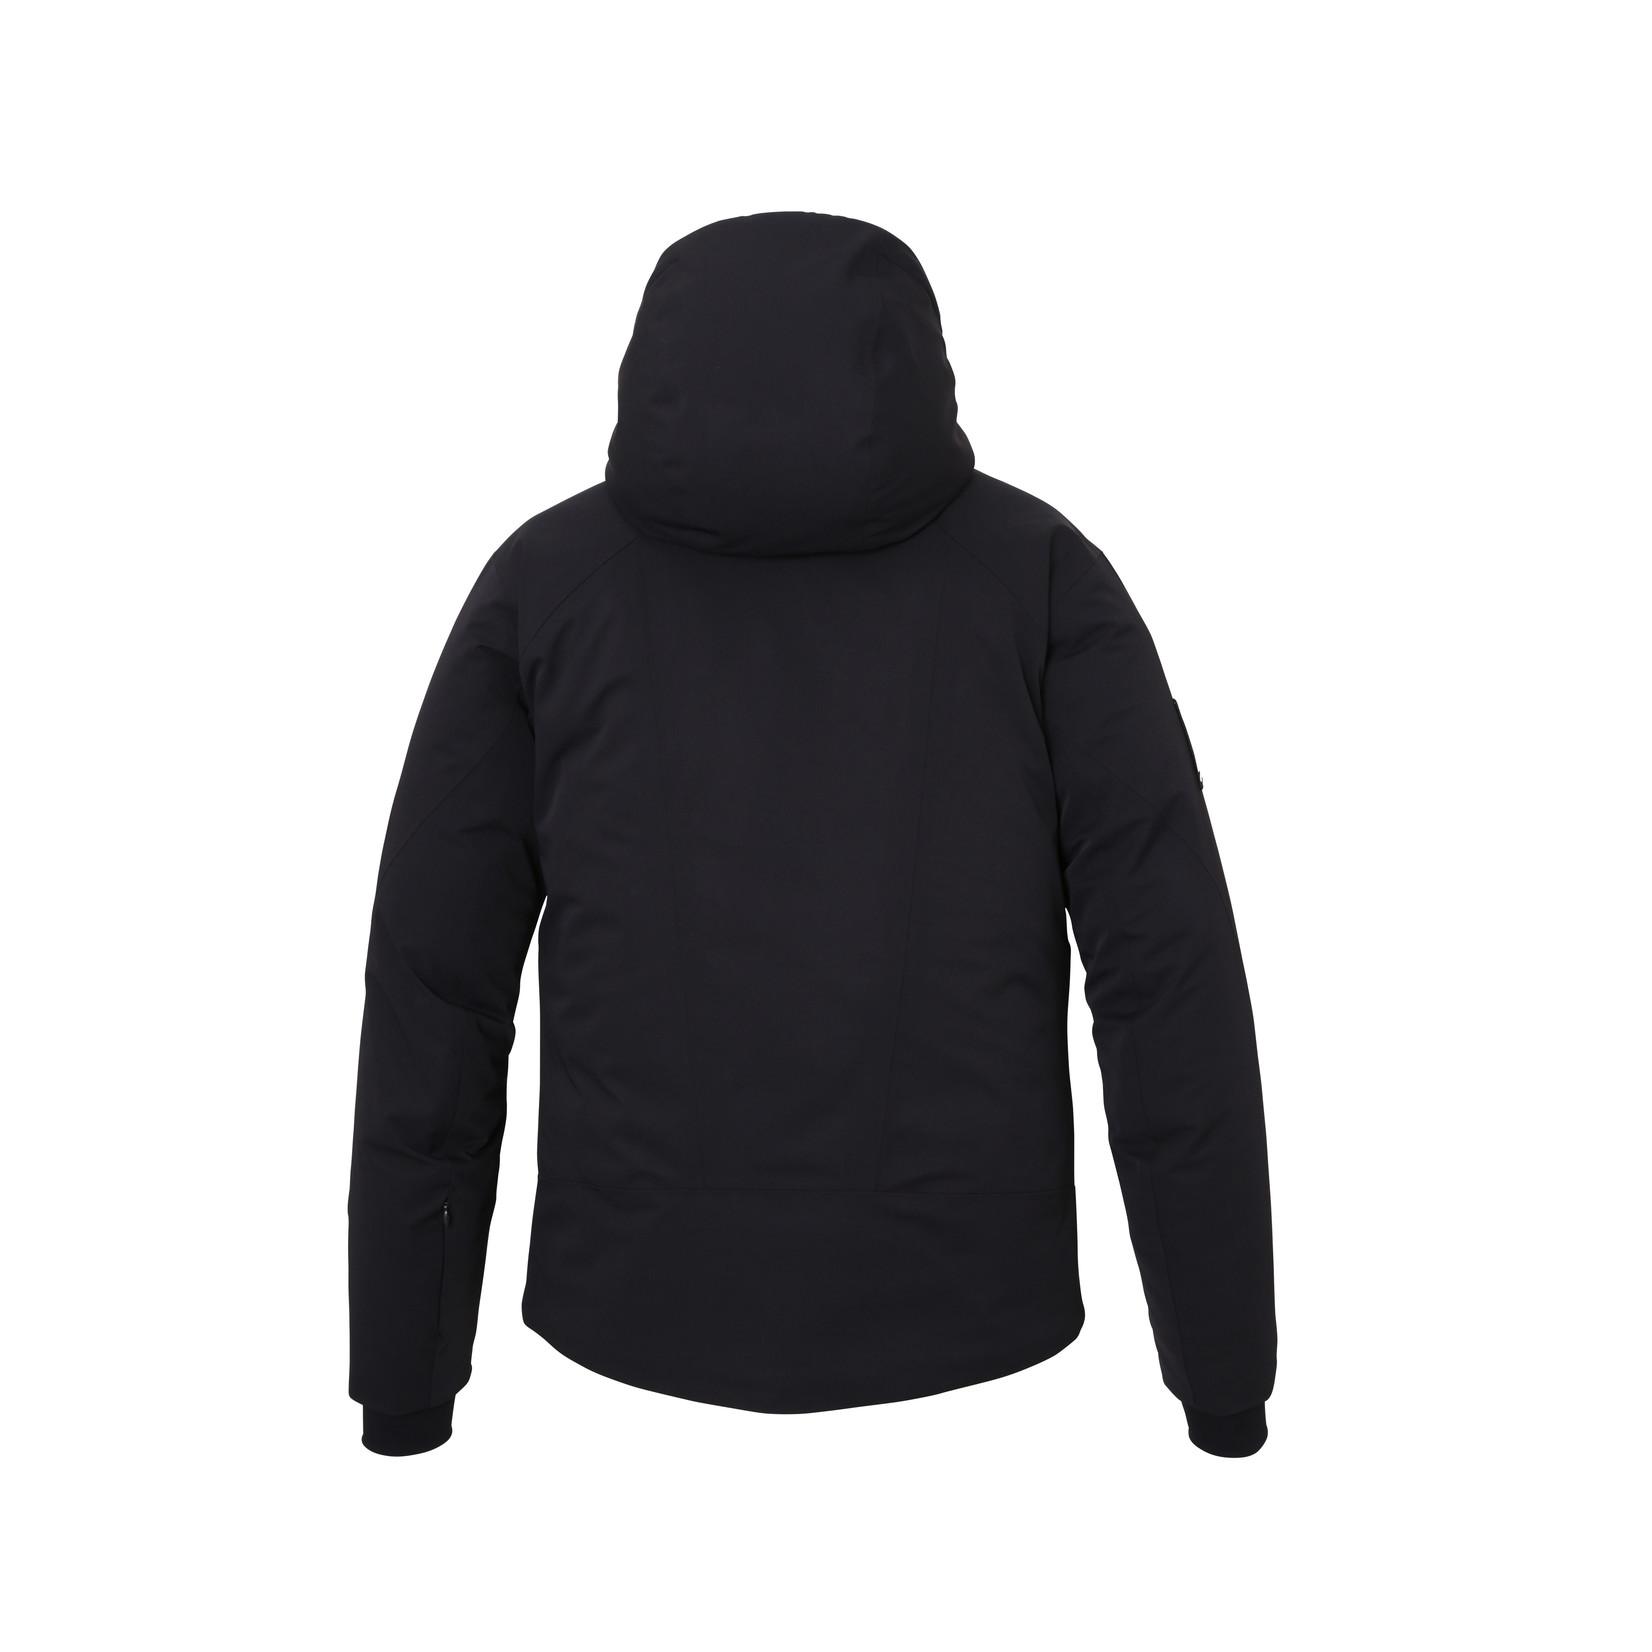 PHENIX Geiranger Jacket